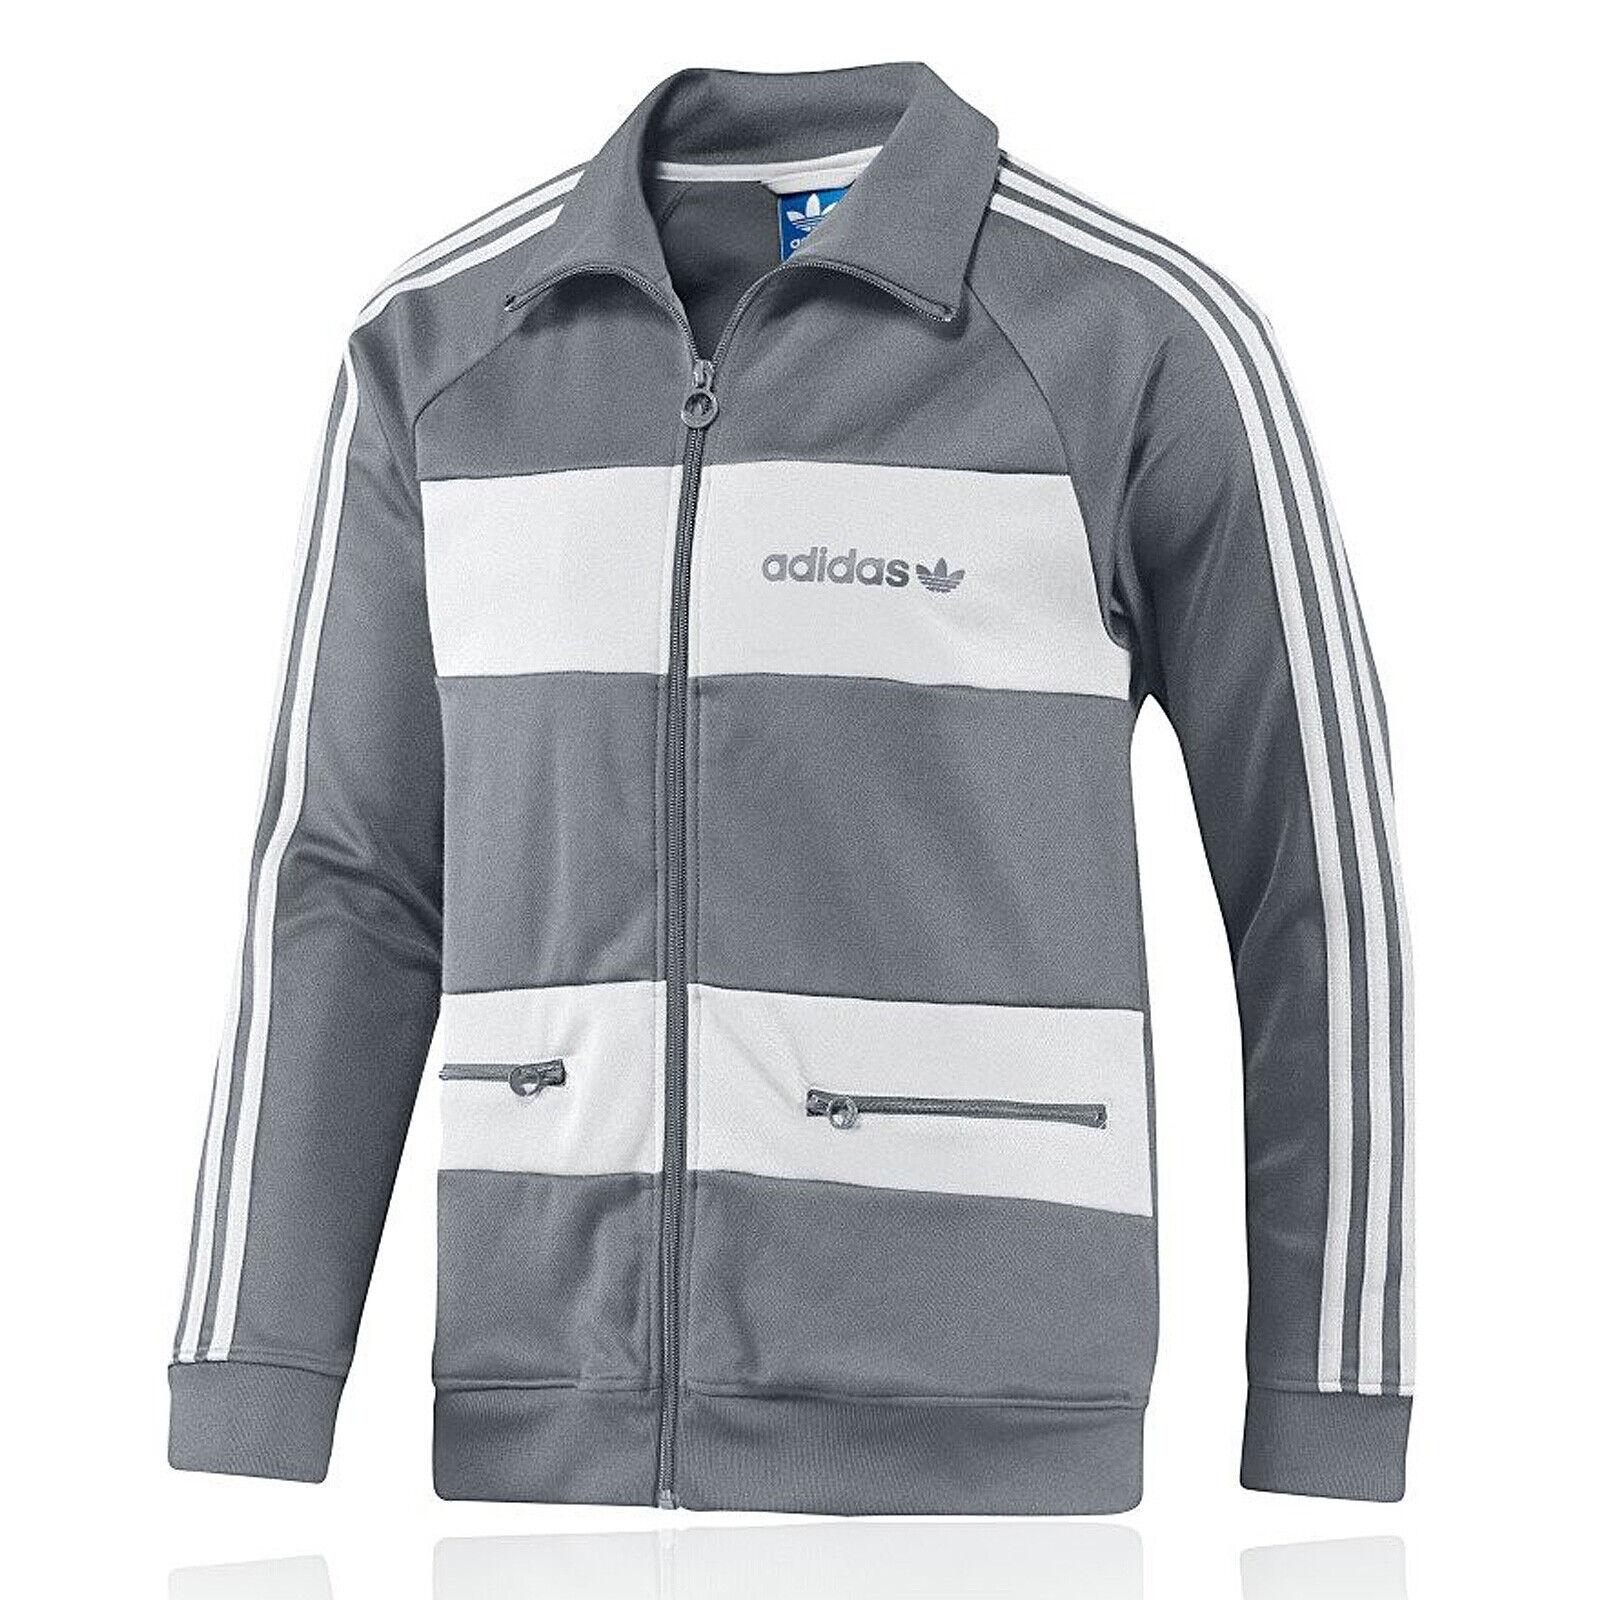 Adidas Originals Beckenbauer Felpa Tuta Europa Giacca Allenamento Grigio Bianco